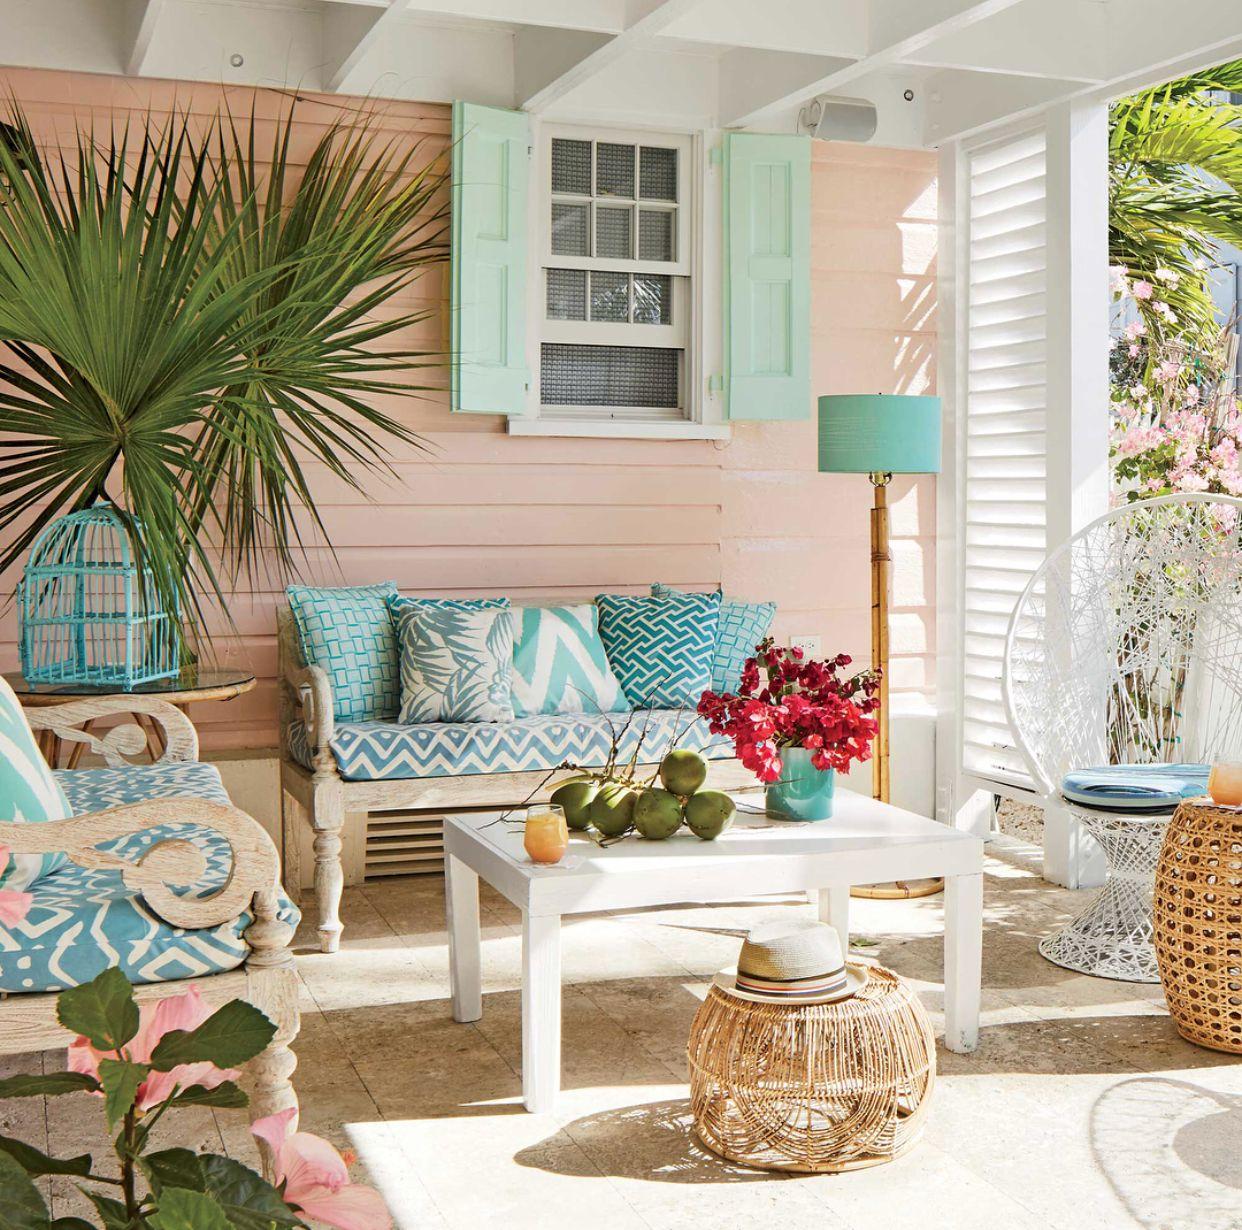 Pin By Lyne Racine On Deco Hawai Beach House Decor Beach House Design Beach House Interior